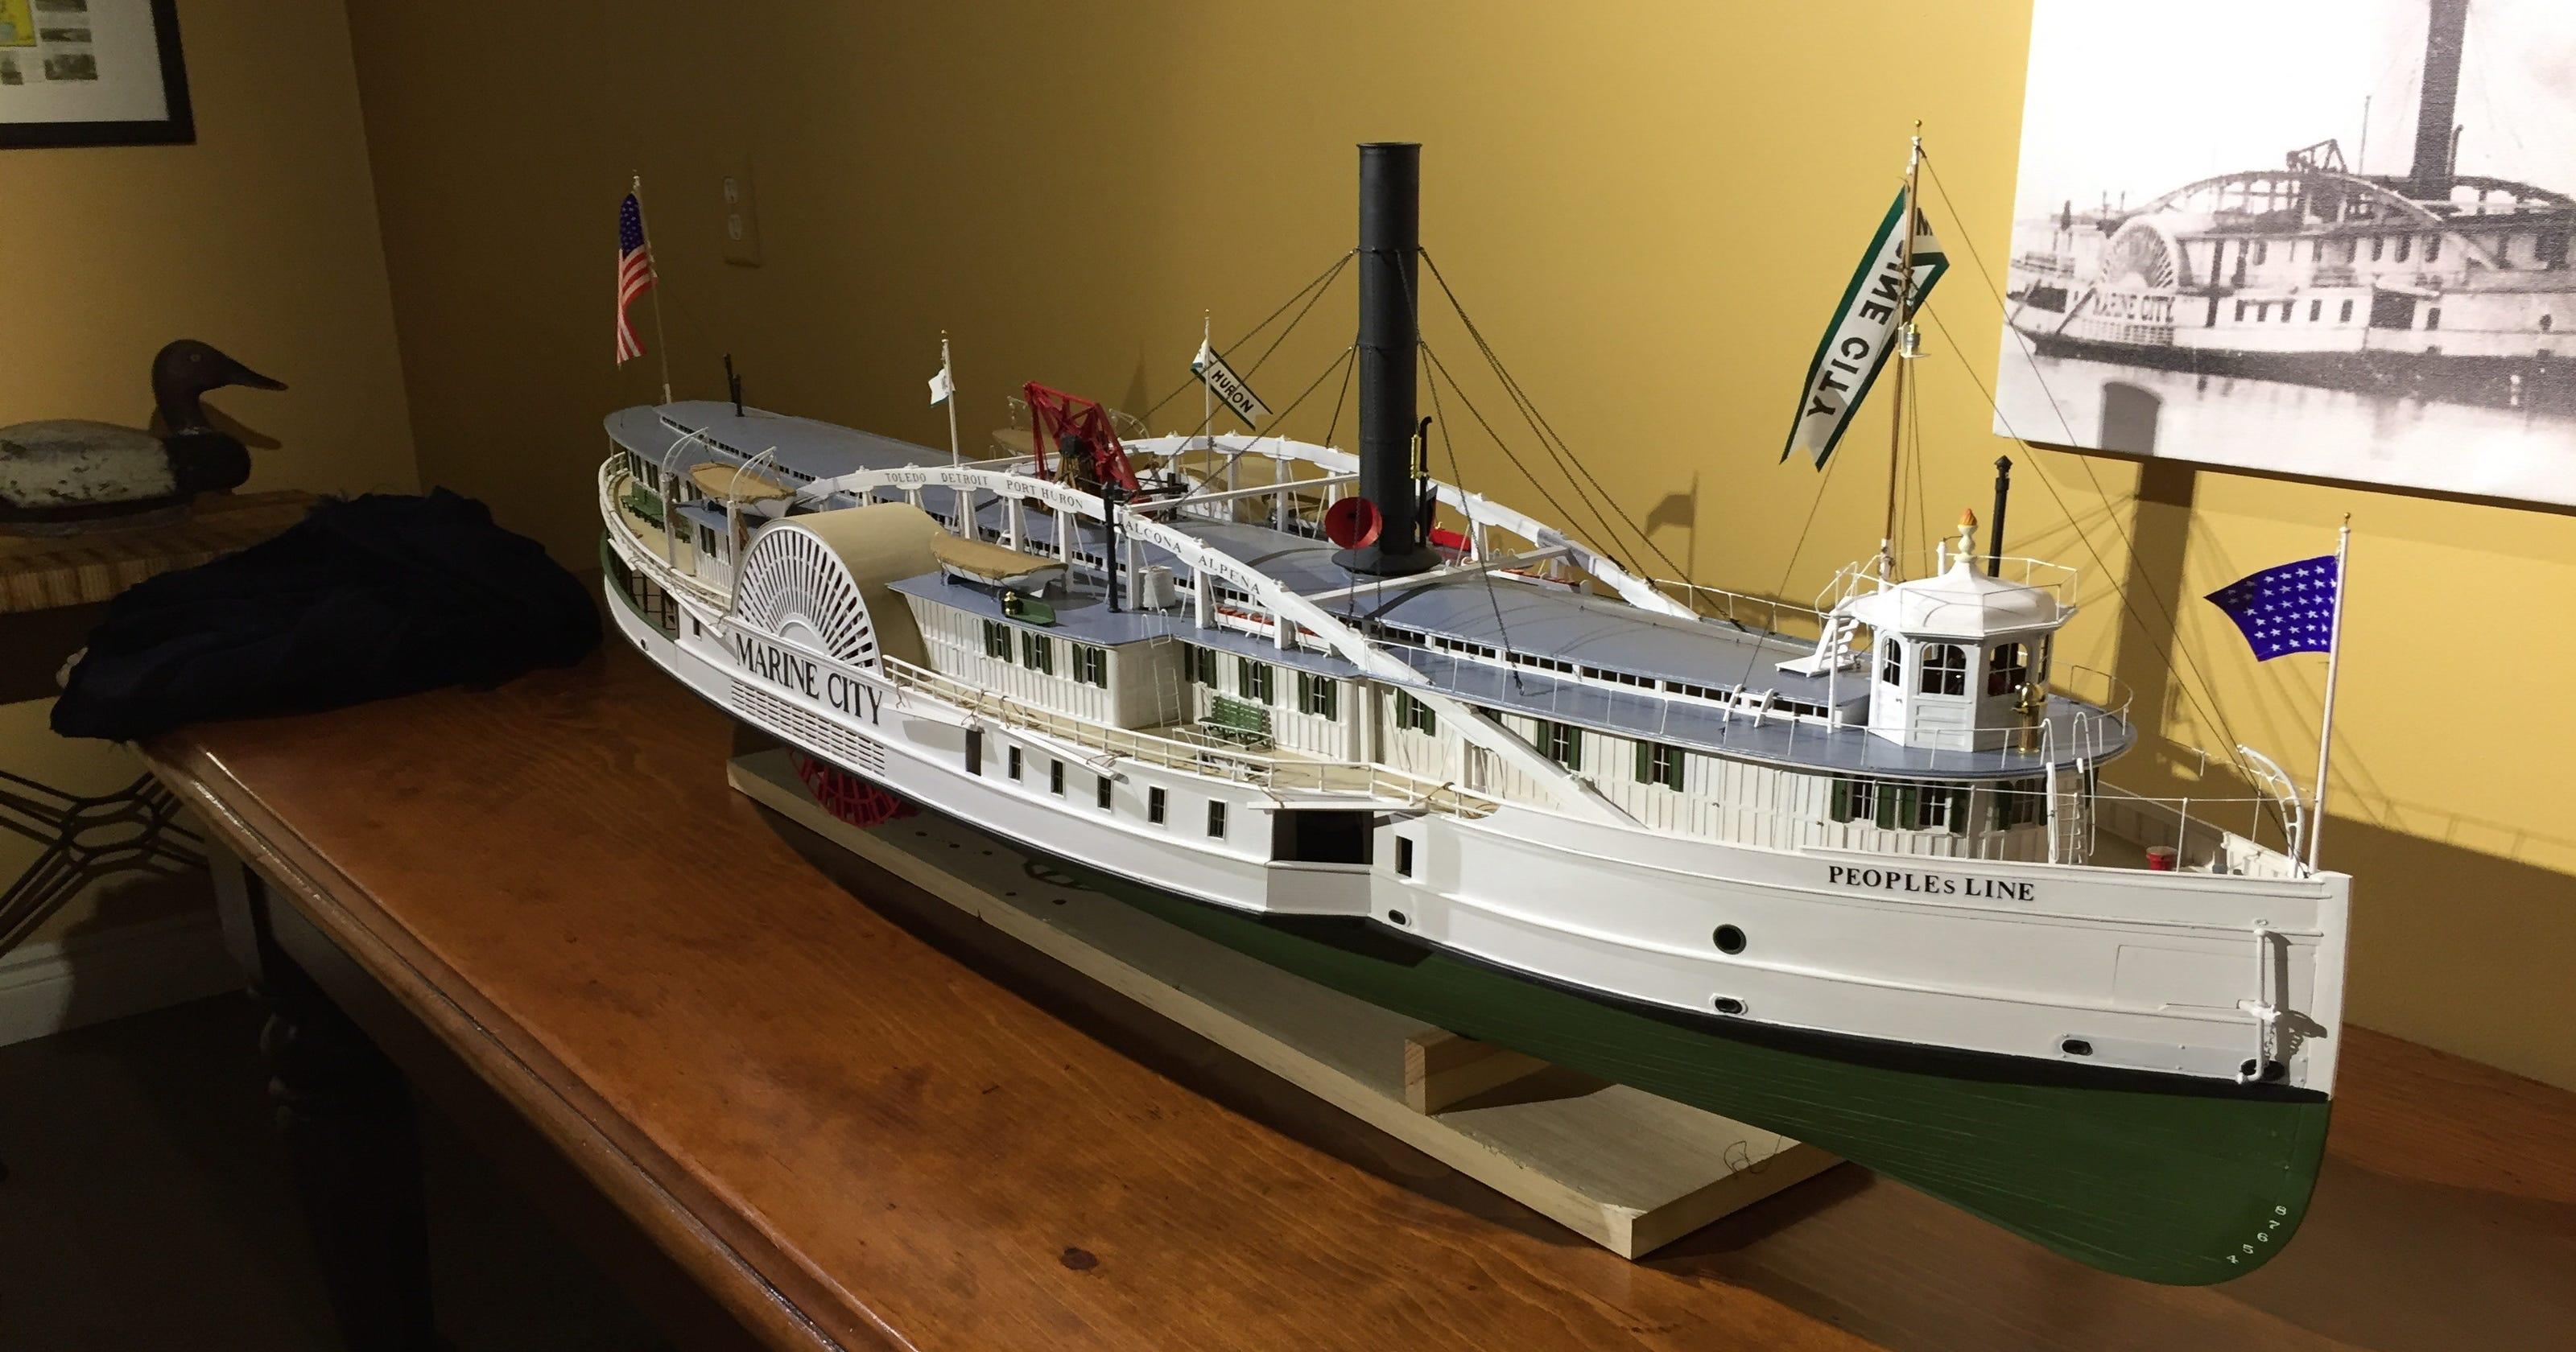 Mariner Theater gallery spotlights Marine City history